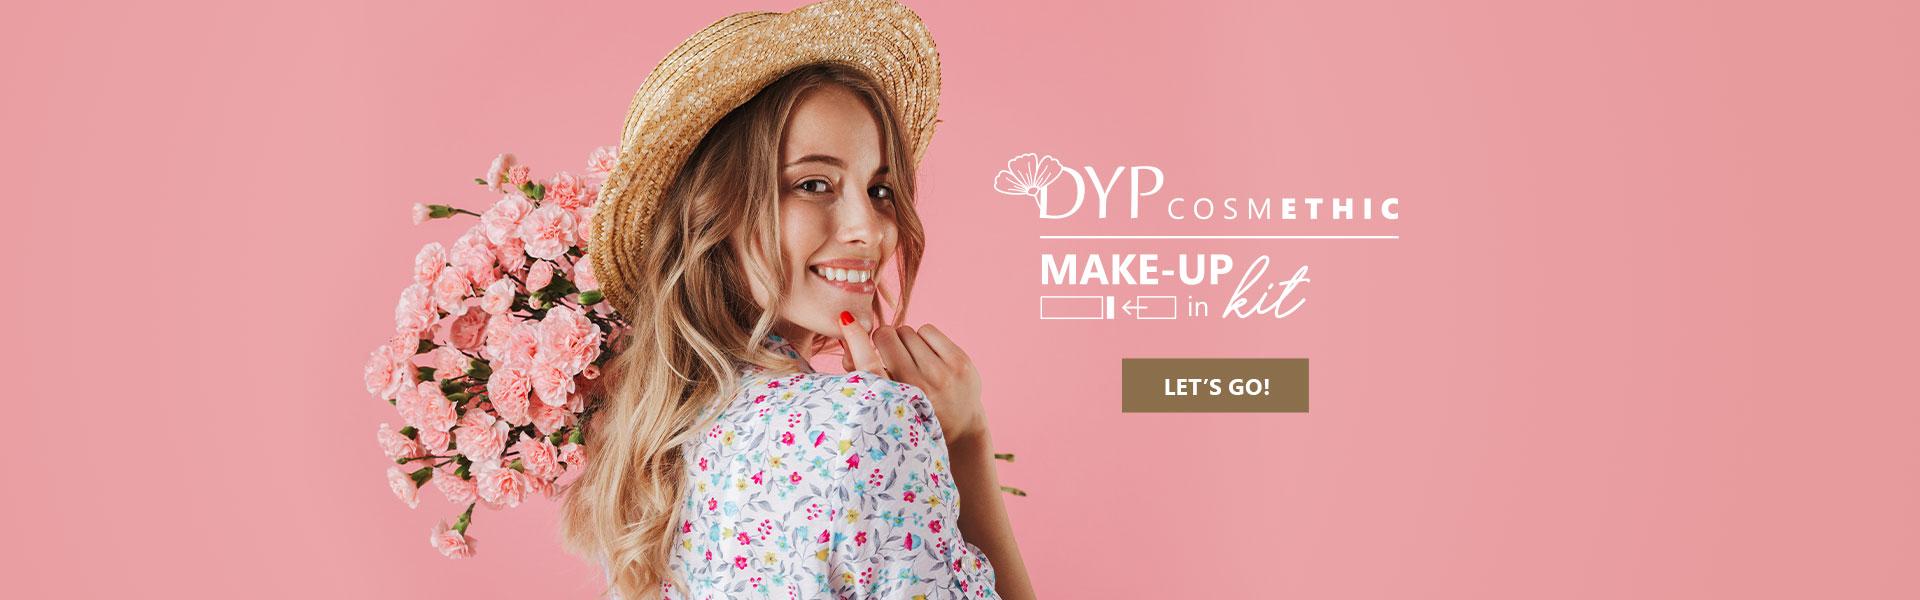 DYP create #3